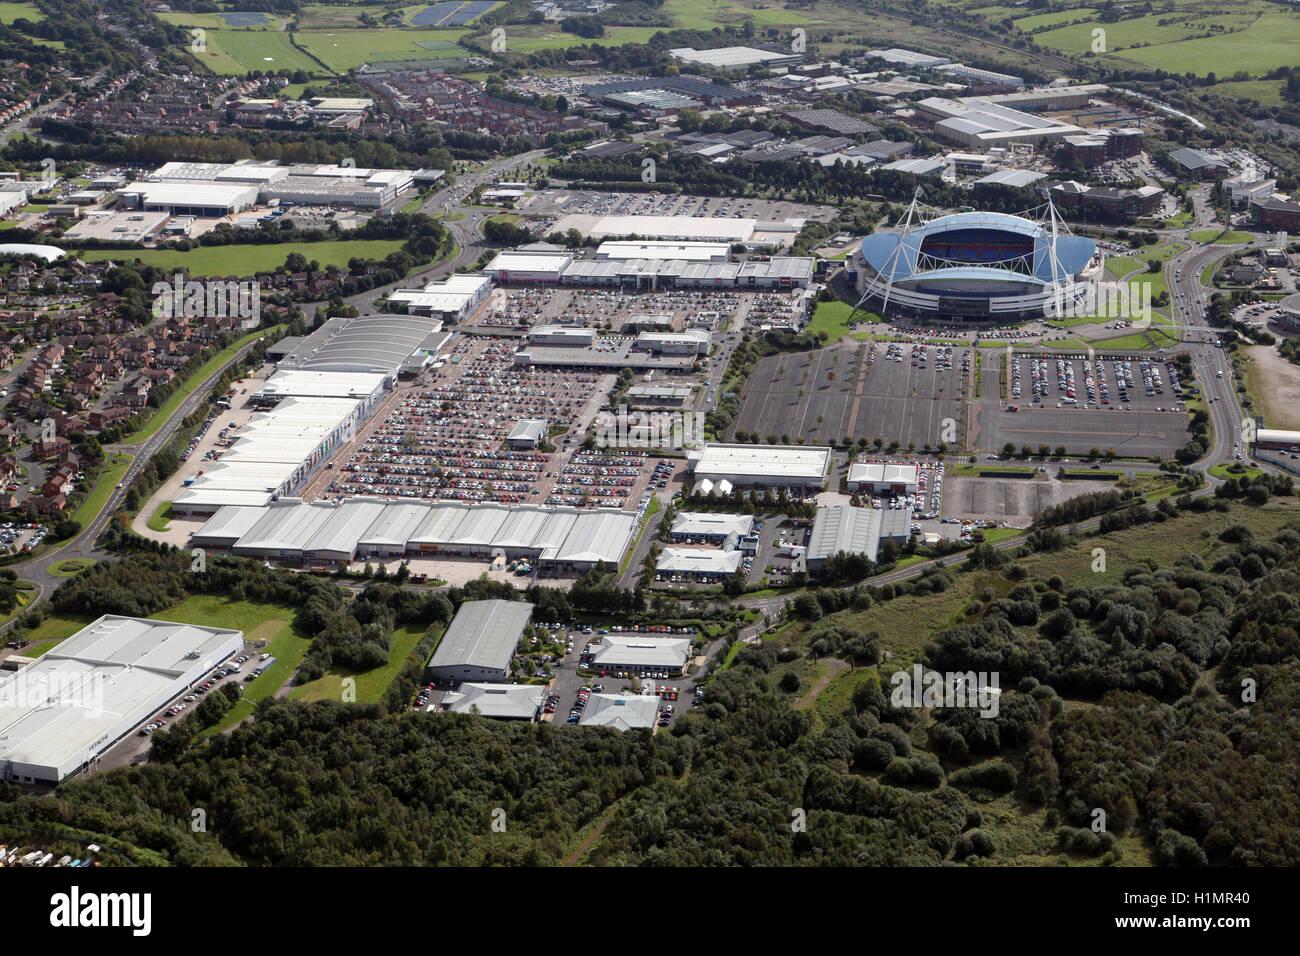 aerial view of the Reebok Stadium and Retail development at Bolton, Lancashire, UK - Stock Image